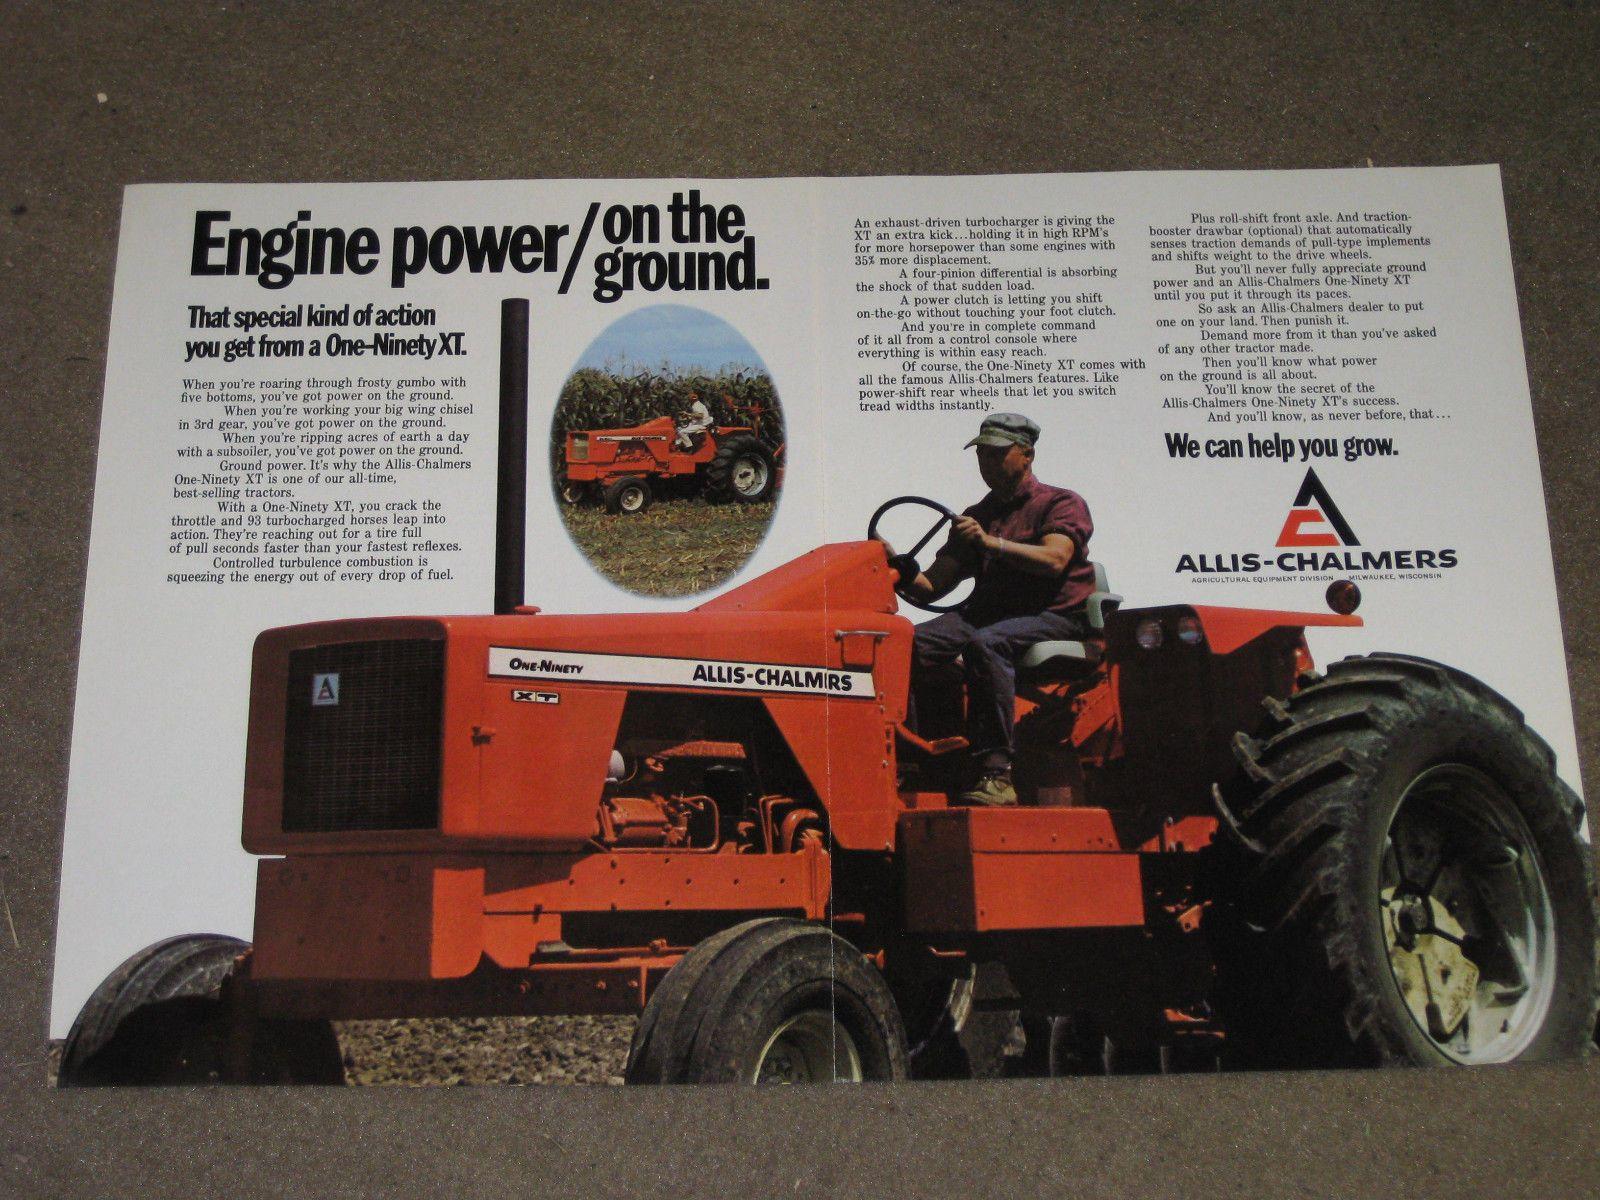 1972 Allis Chalmers 190 XT Tractor Ad   eBay   Allis ...